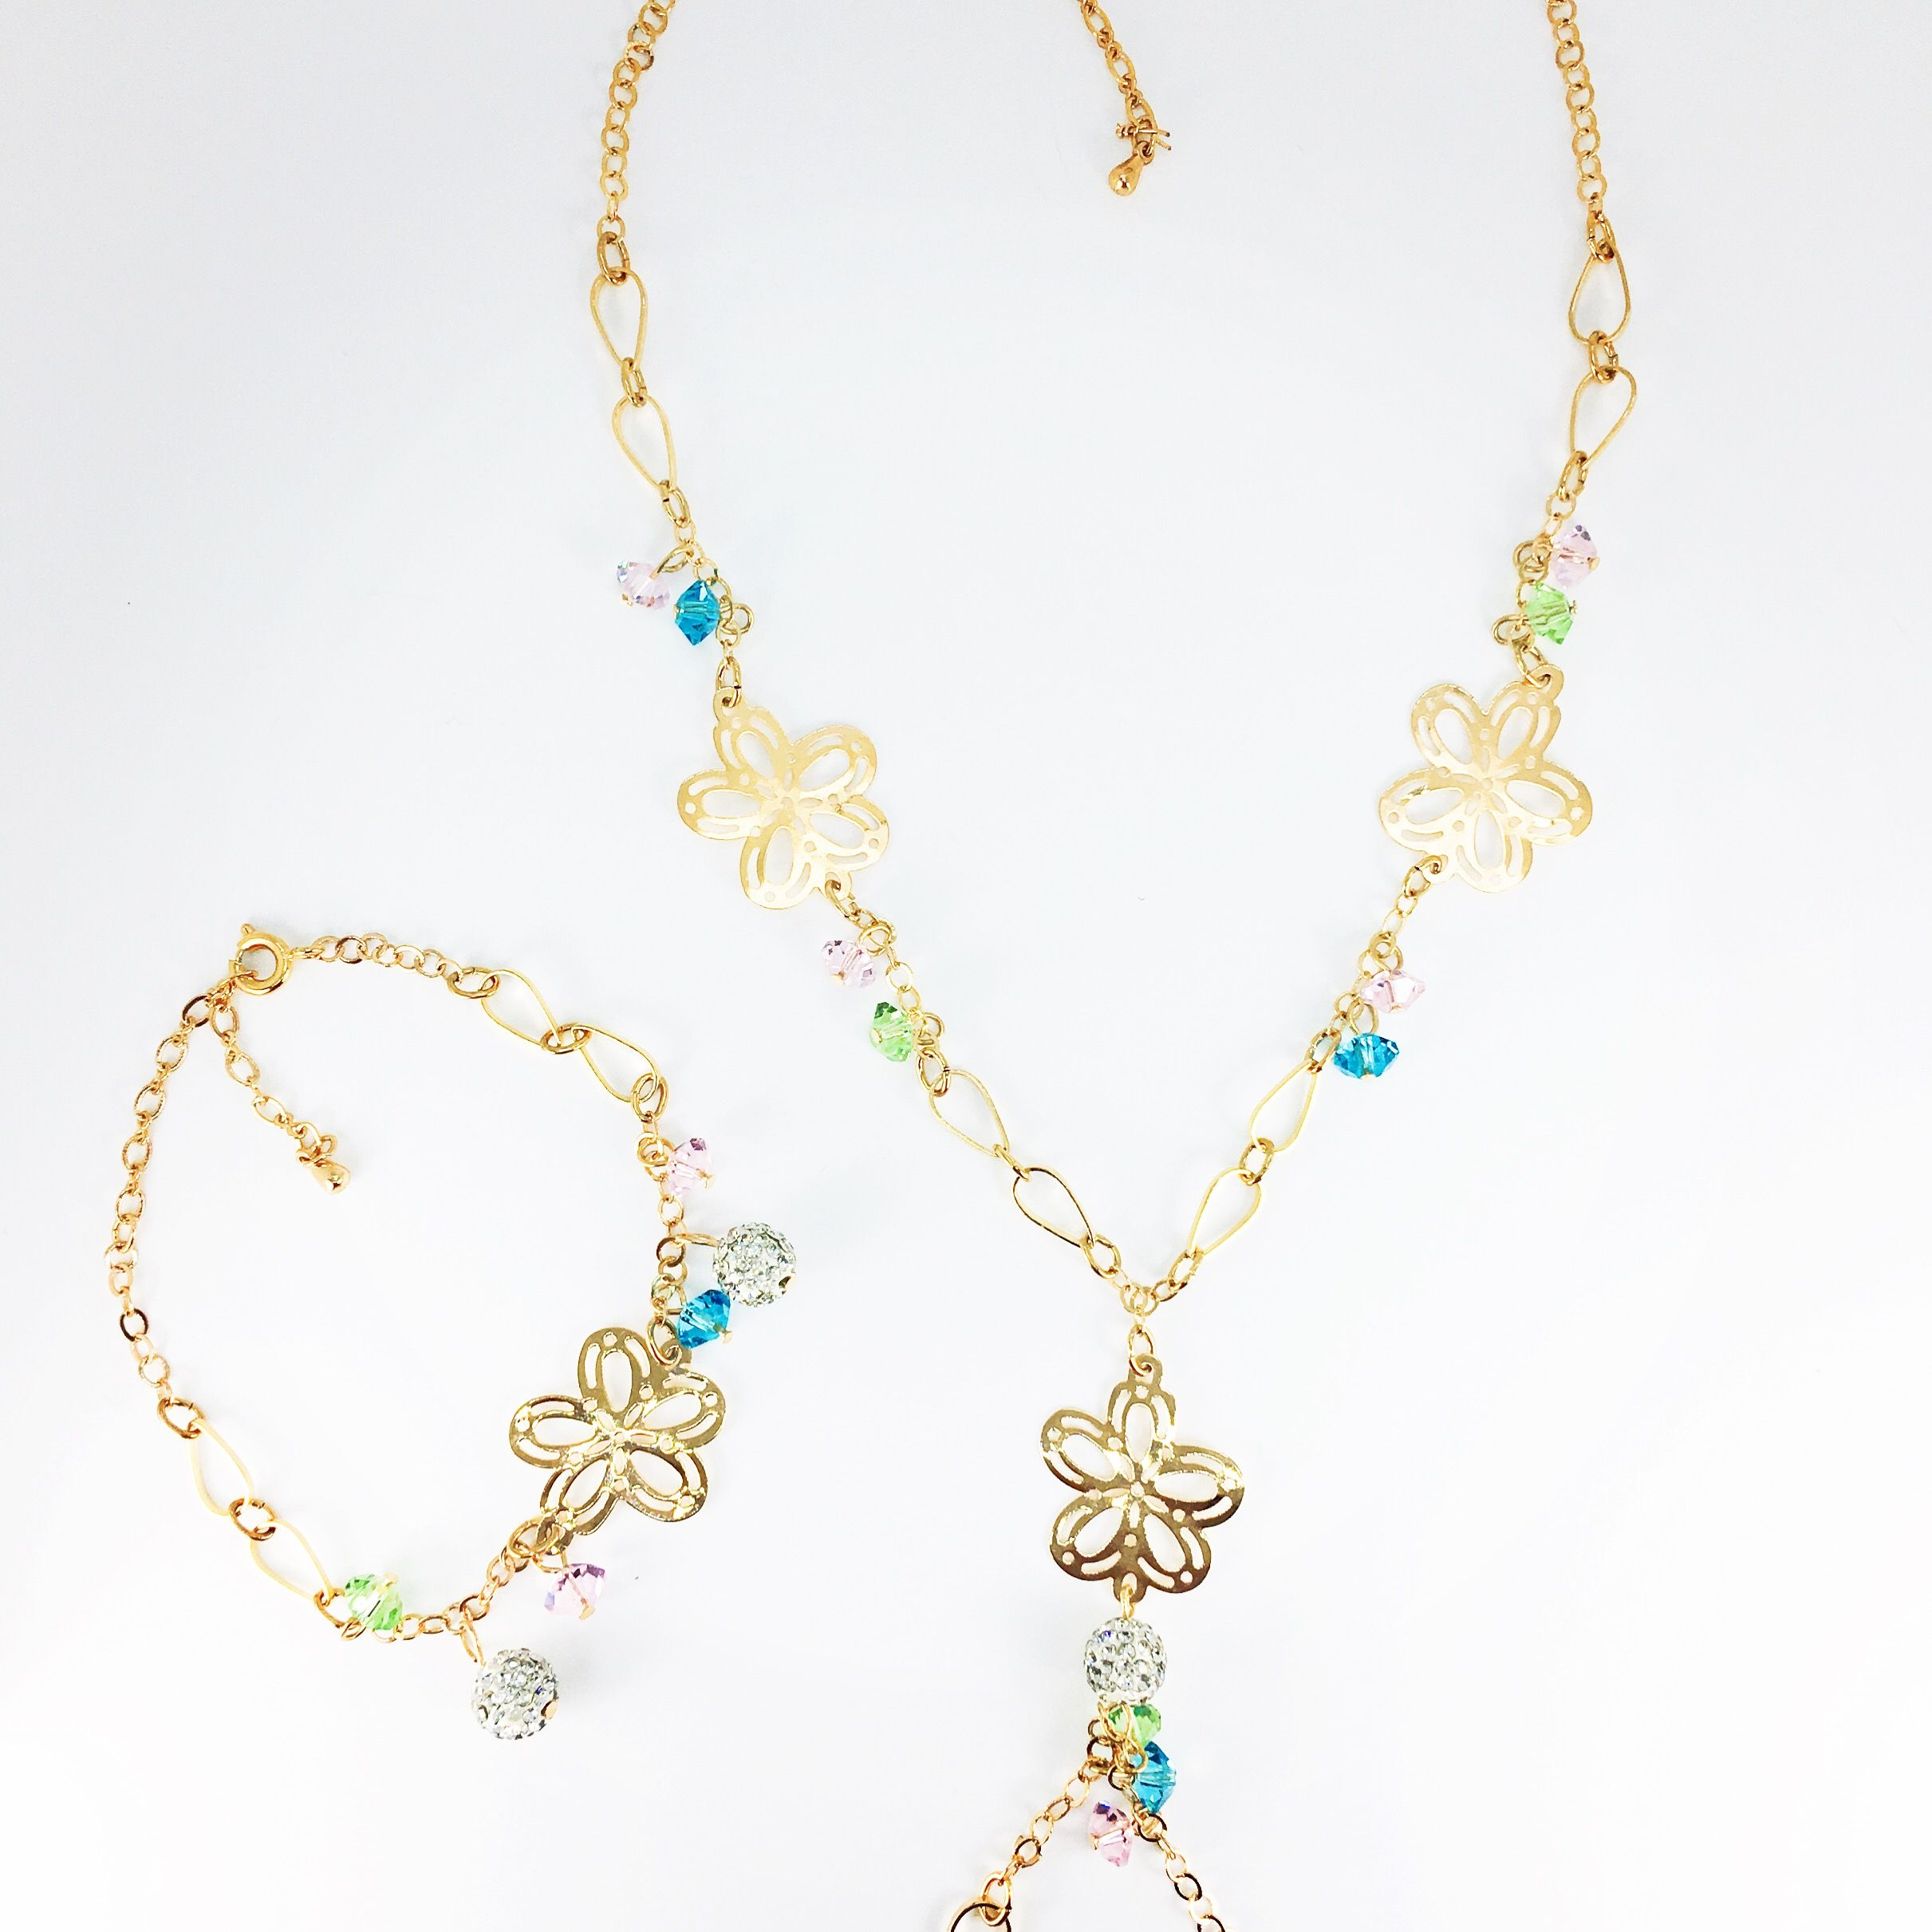 K gold plated flower necklace and bracelet set jewelry sets